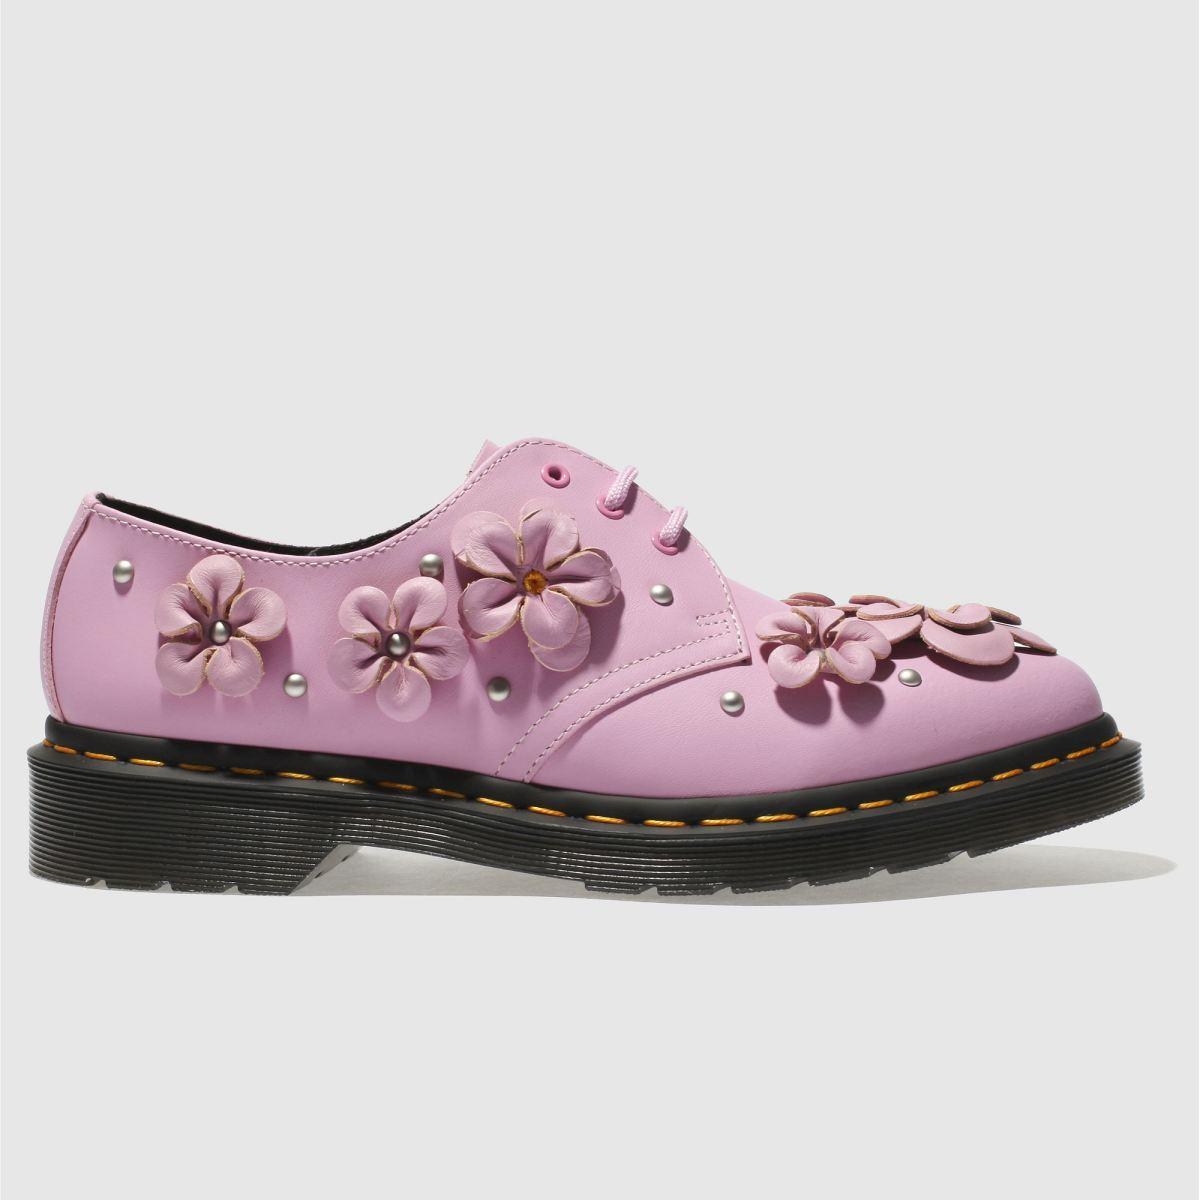 Dr Martens Pale Pink 1461 Flower Flat Shoes